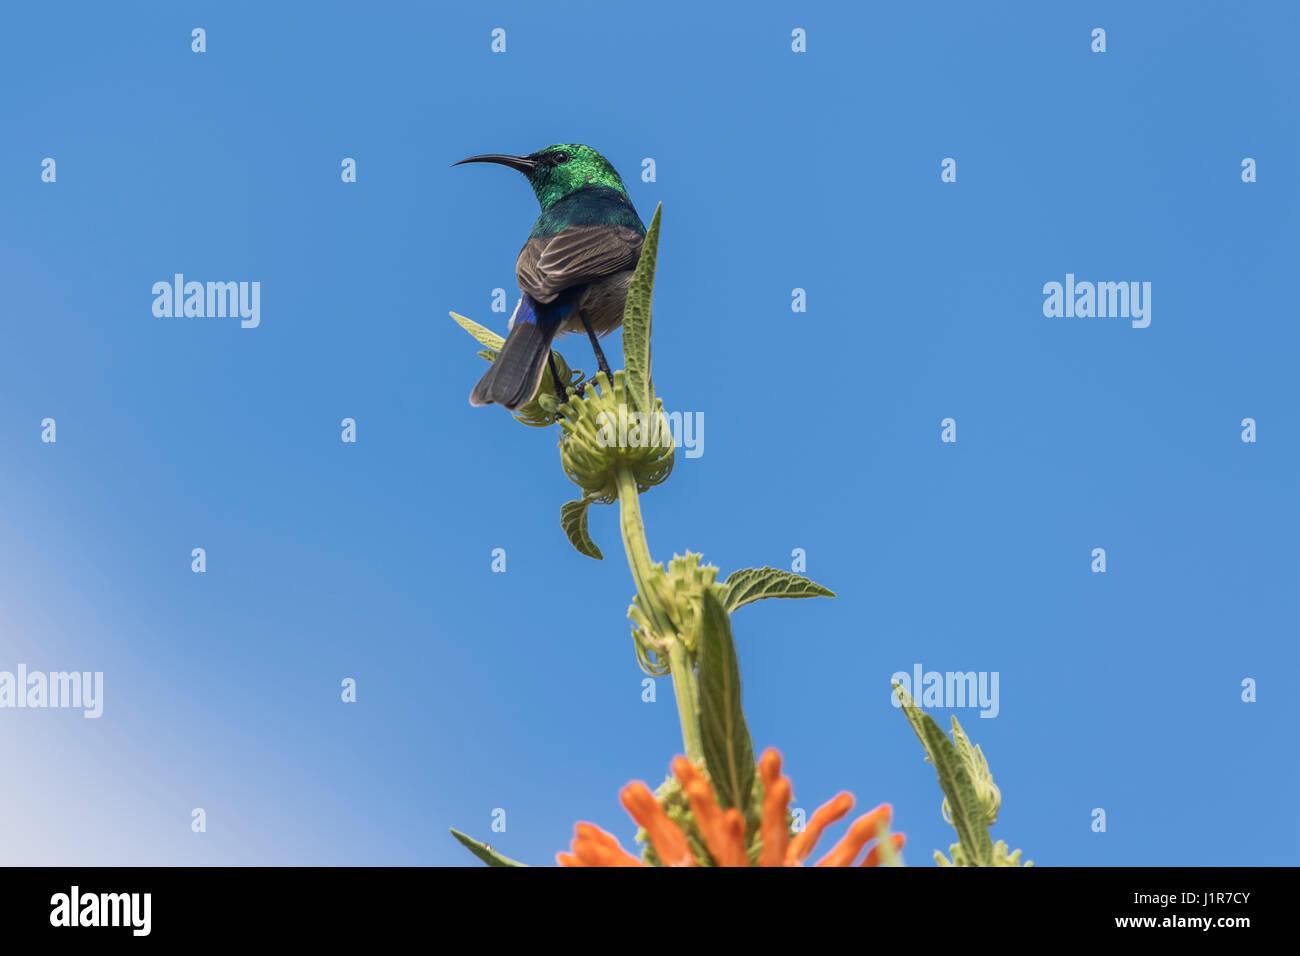 Southern Double-collared Sunbird (Cinnyris chalybeus), sitting on plant, Kirstenbosch National Botanical Garden, - Stock Image